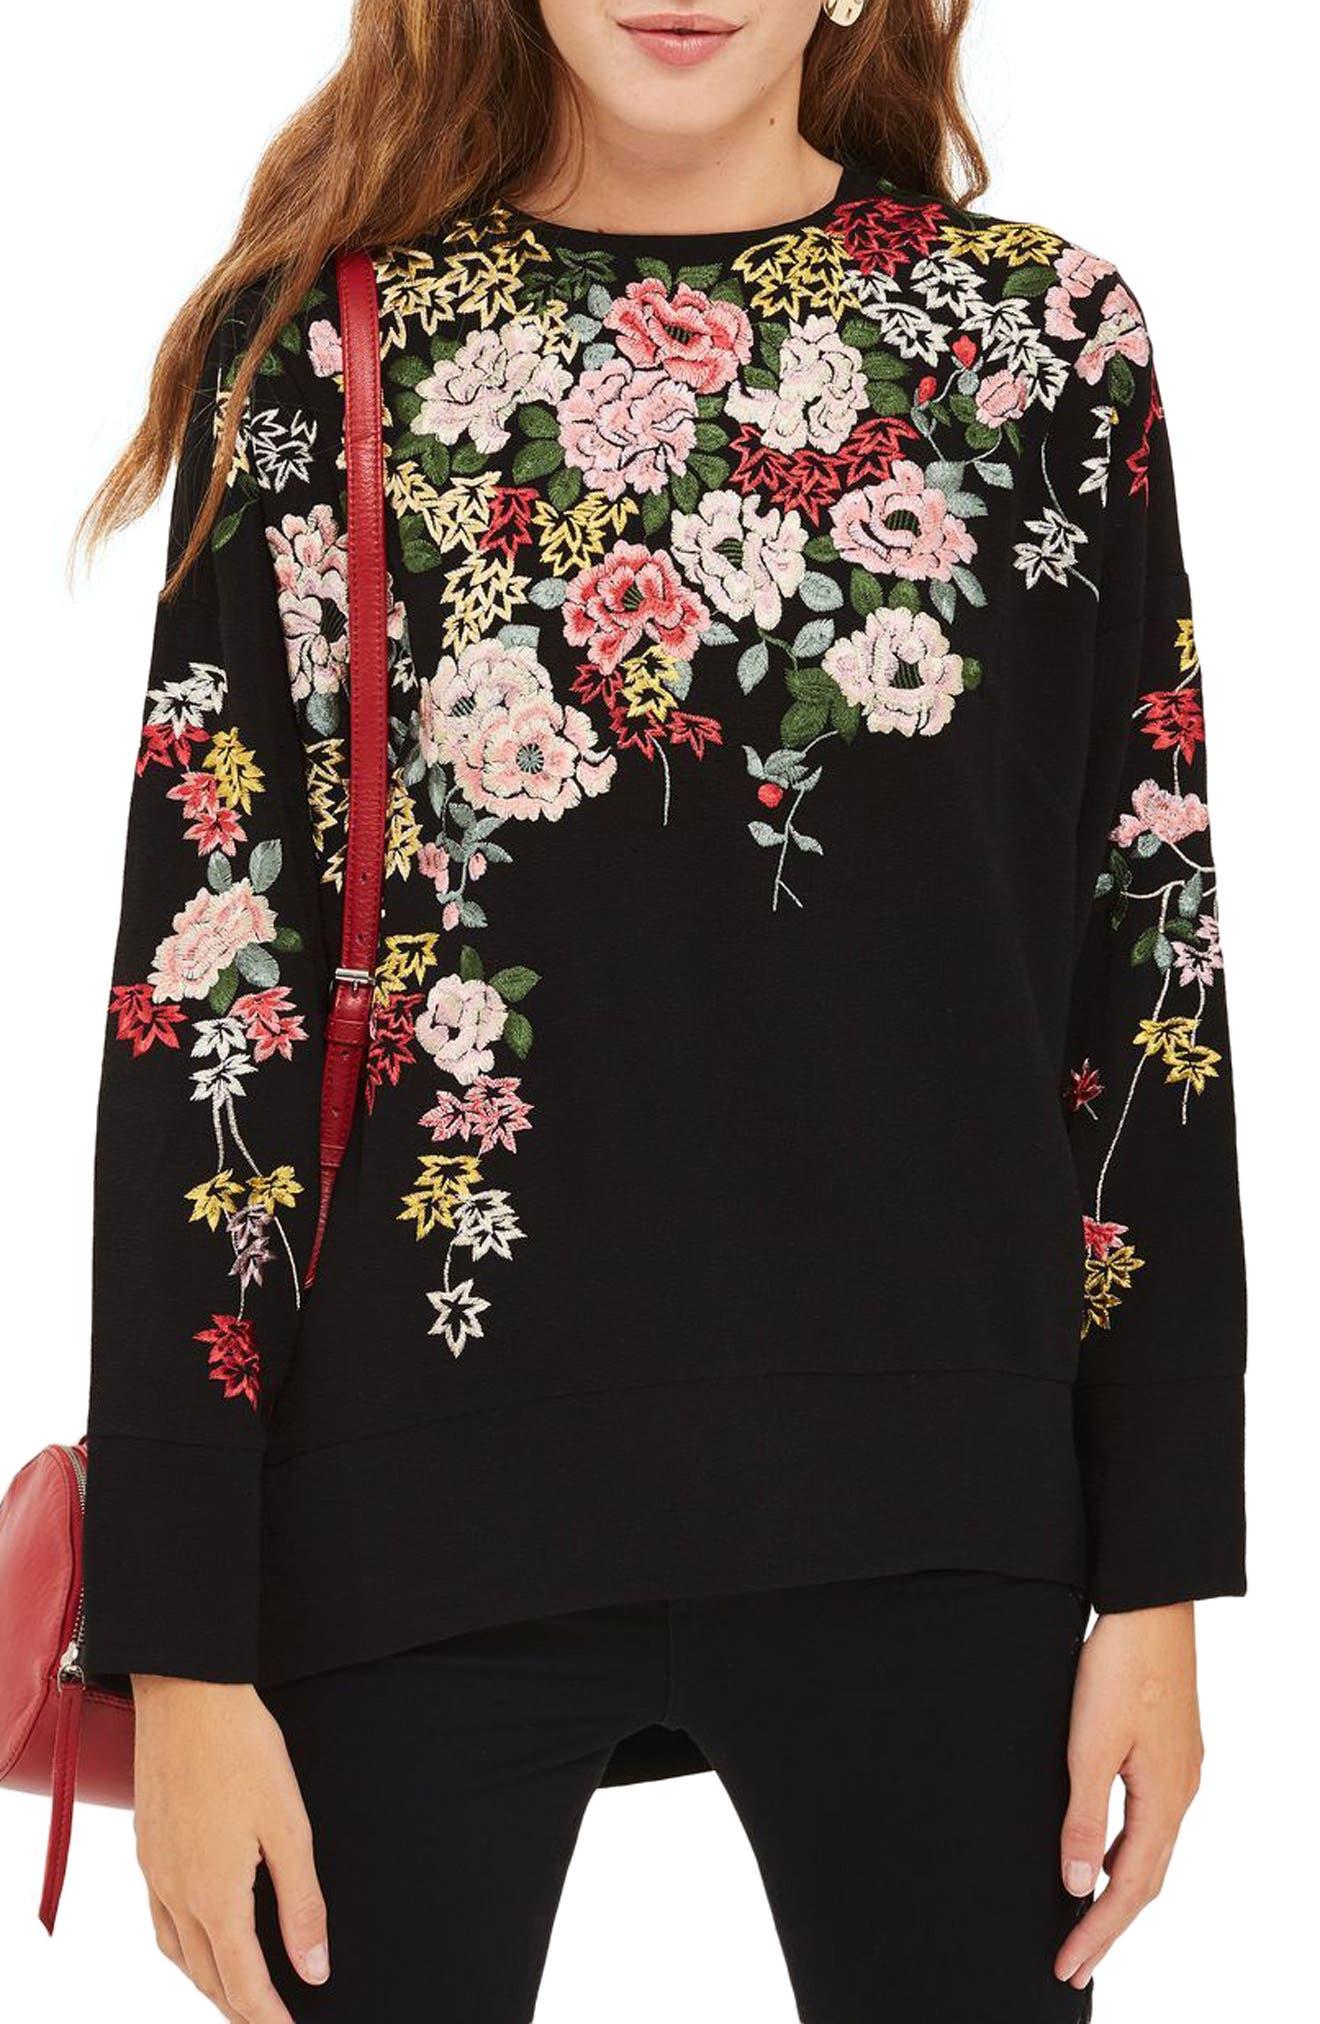 Kimono Embroidered Sweatshirt,                             Main thumbnail 1, color,                             001